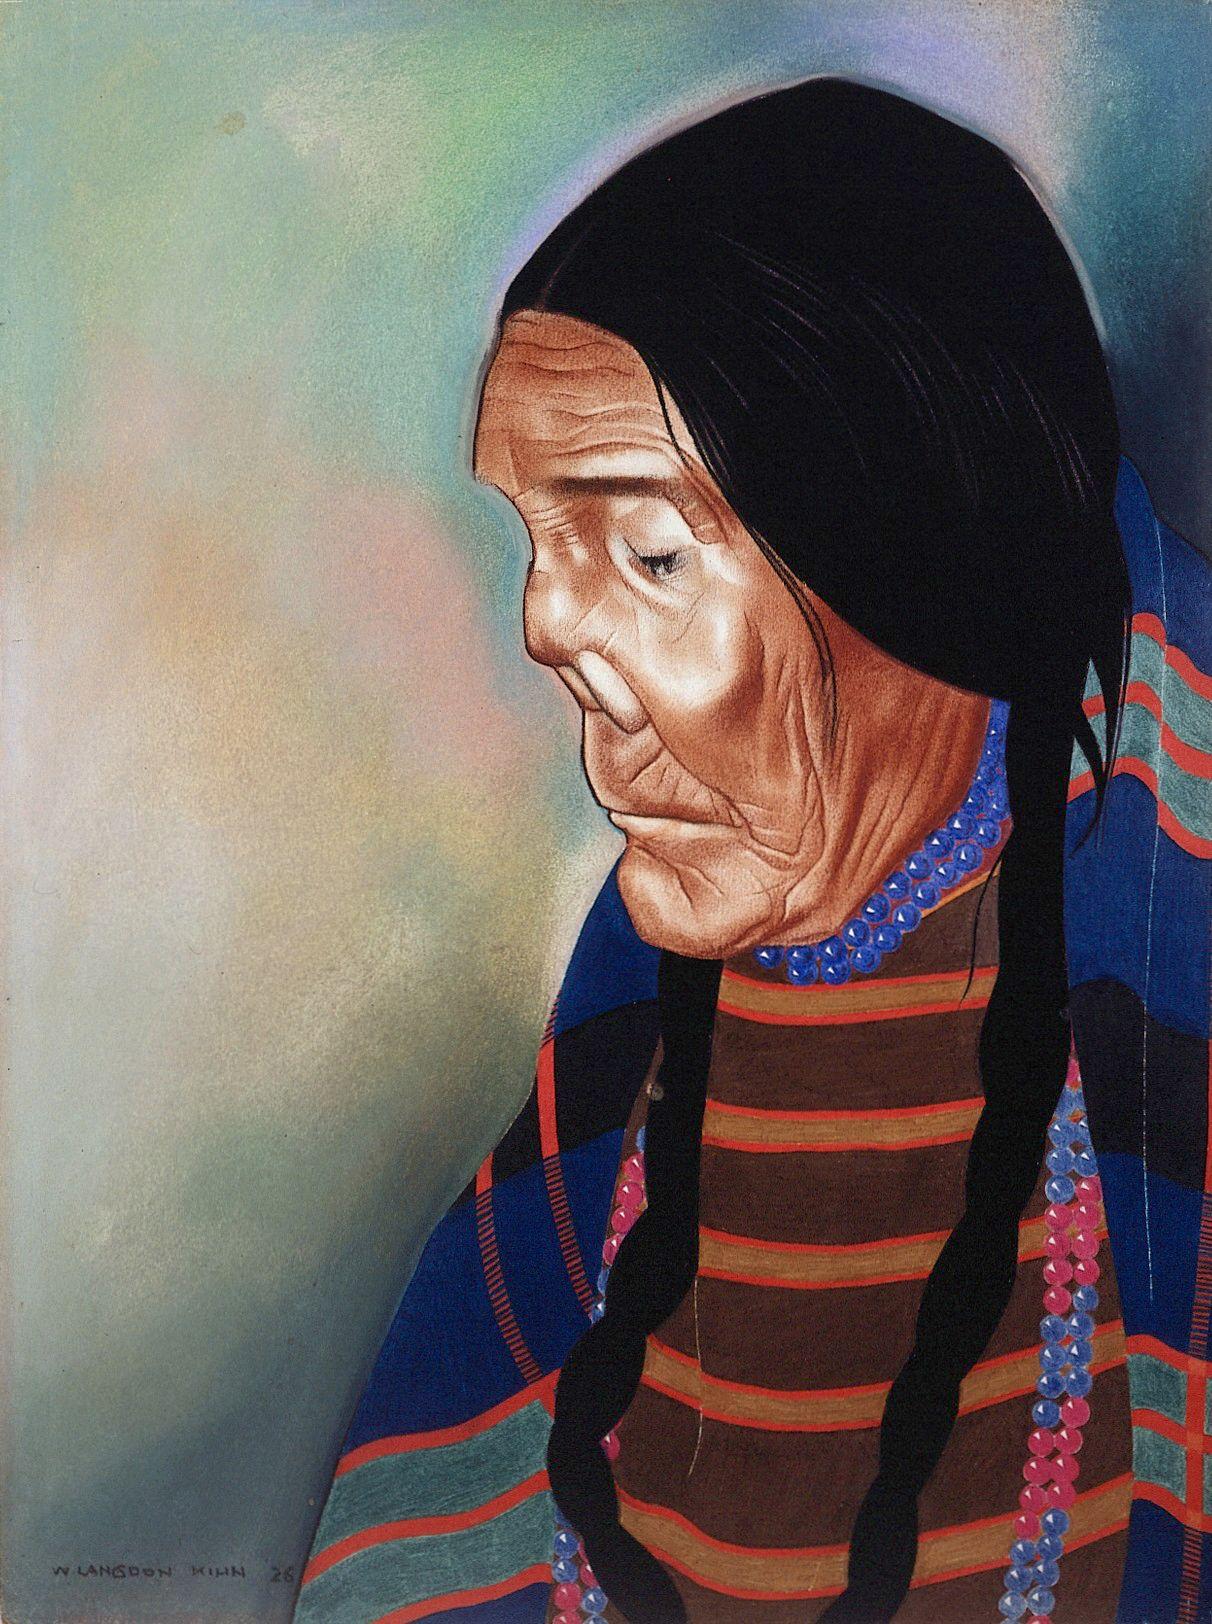 Portrait of Rosie Ground or Cut-nose, of the Blackfeet tribe